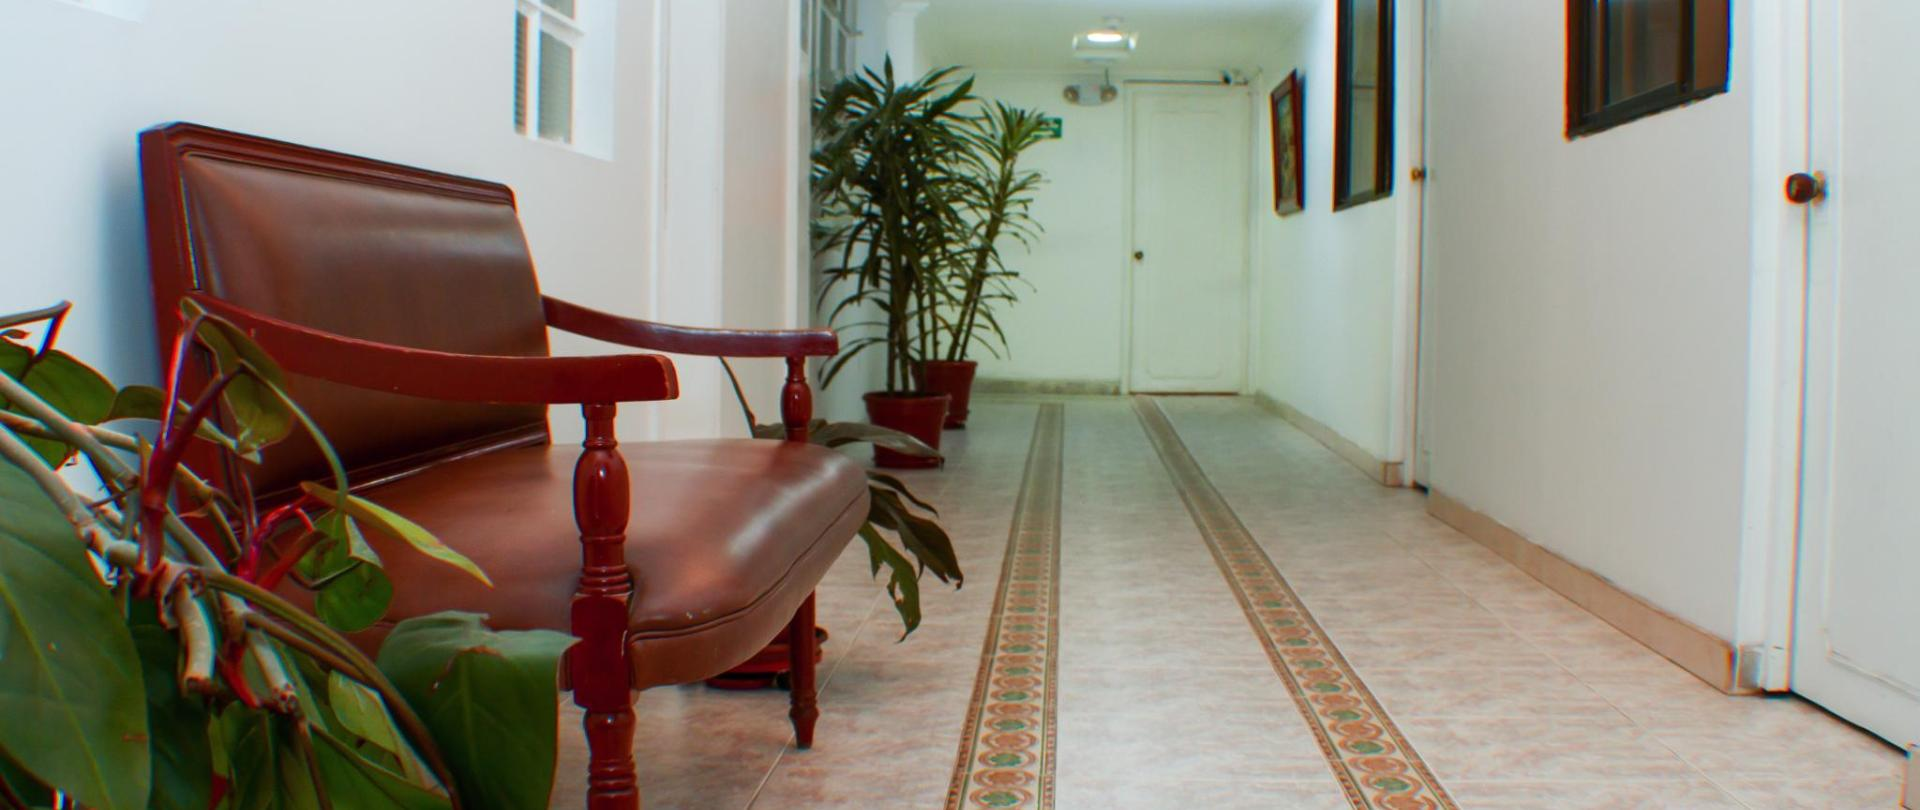 Hotel_Siar-8316.jpg